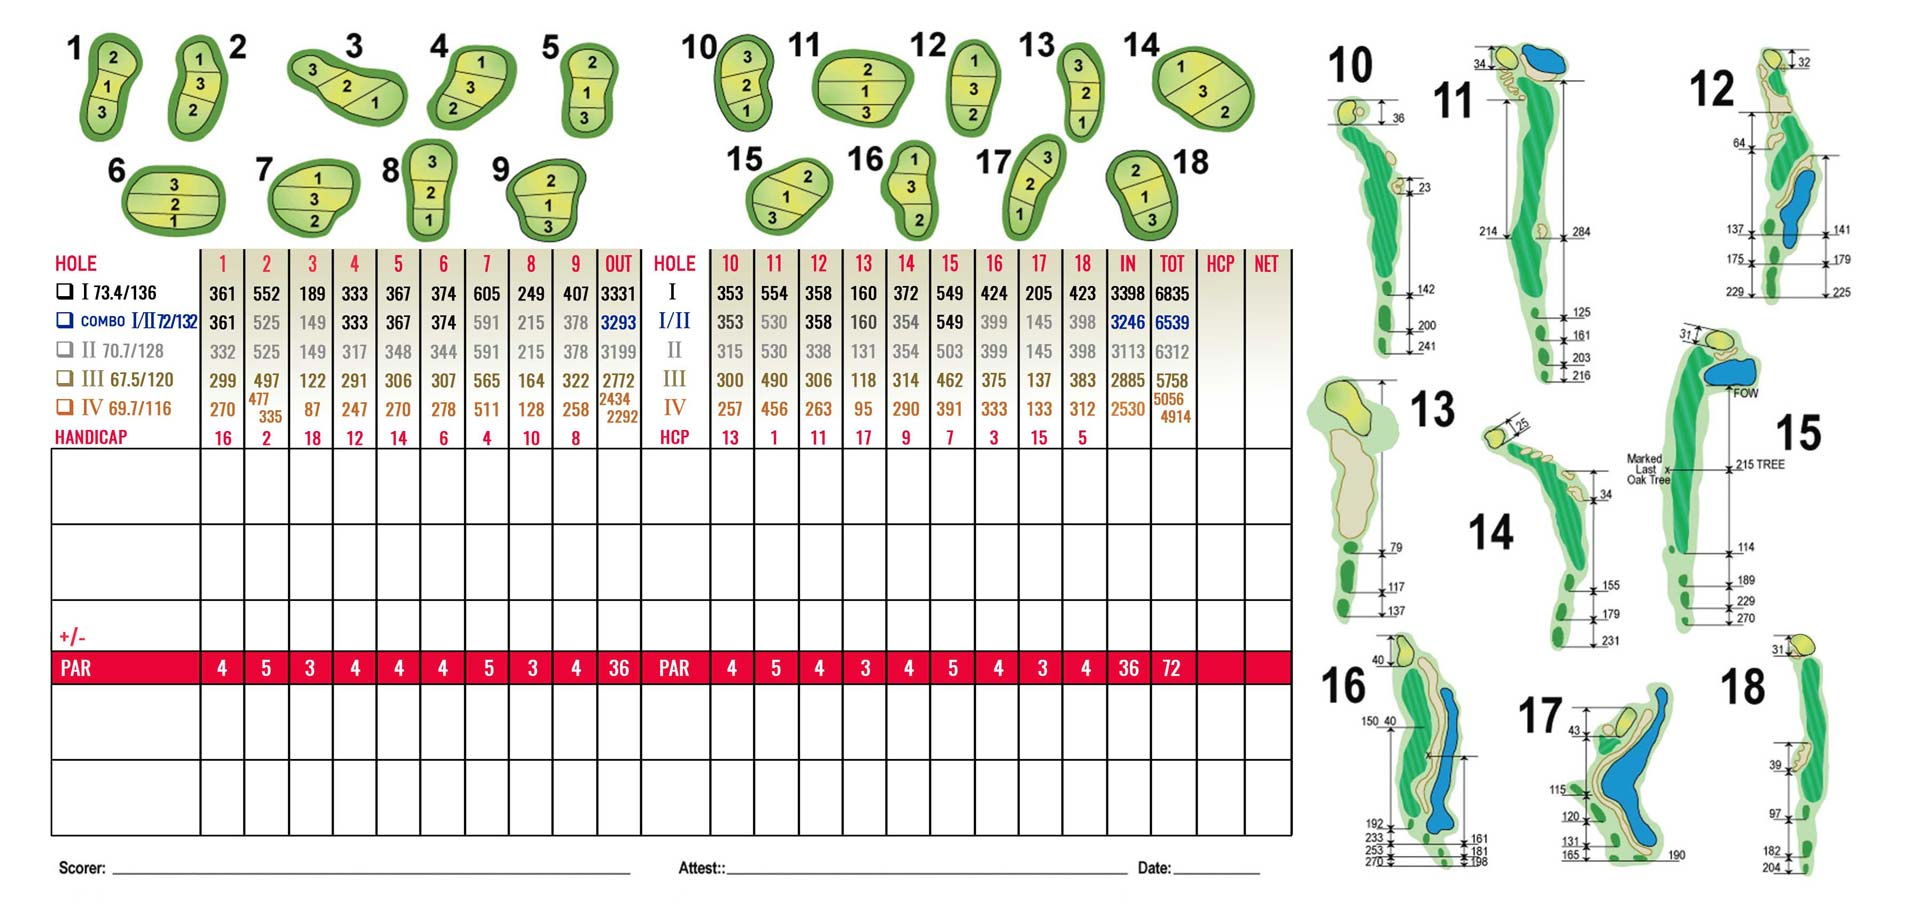 2021 Sandy Pines Scorecard front